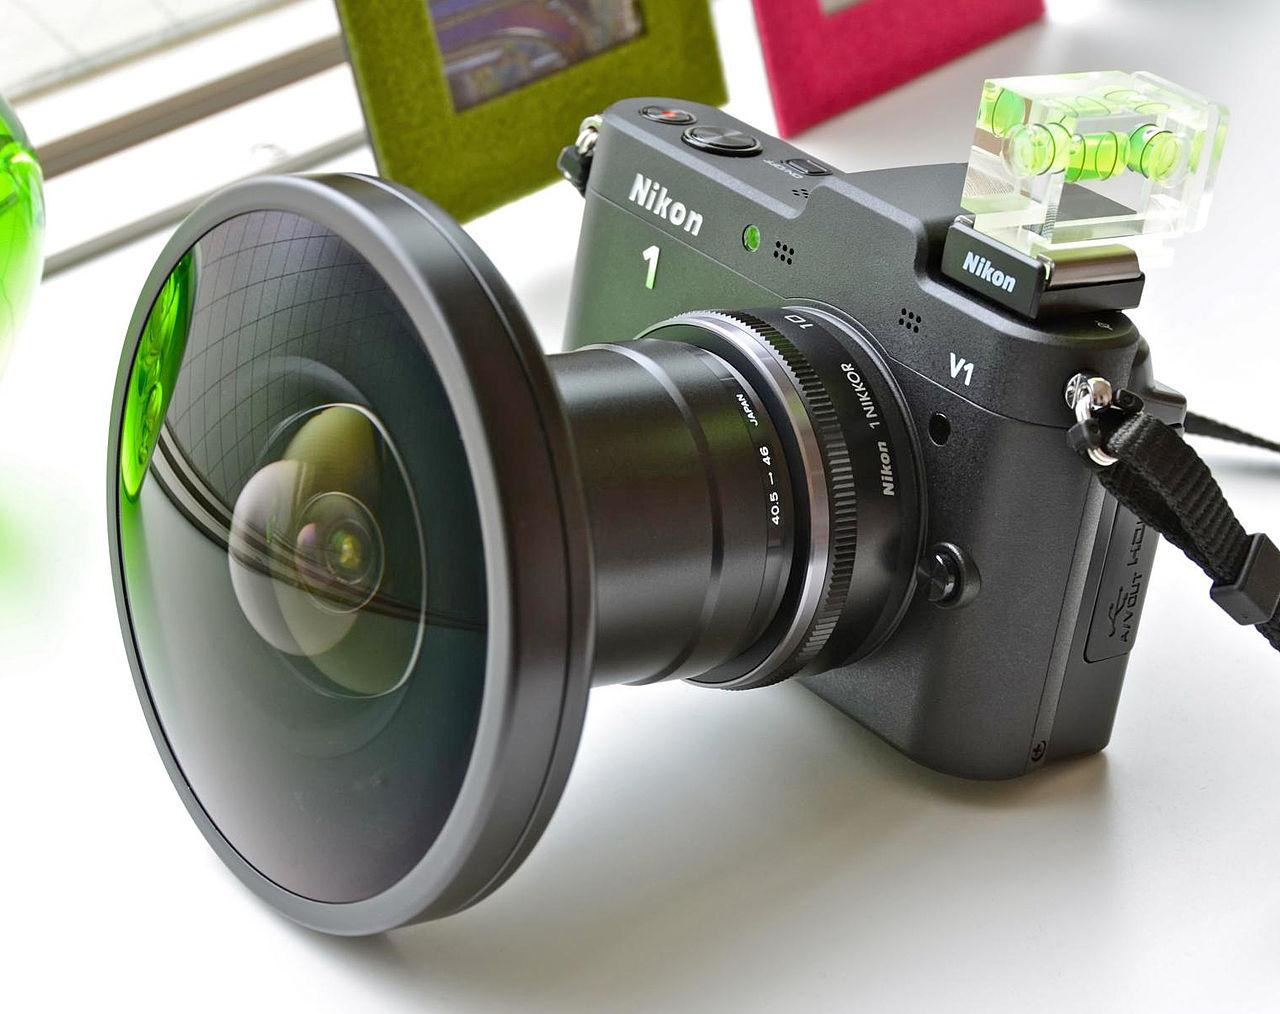 File:Nikon 1 V1 + Fisheye FC-E9 01.jpg - Wikimedia Commons